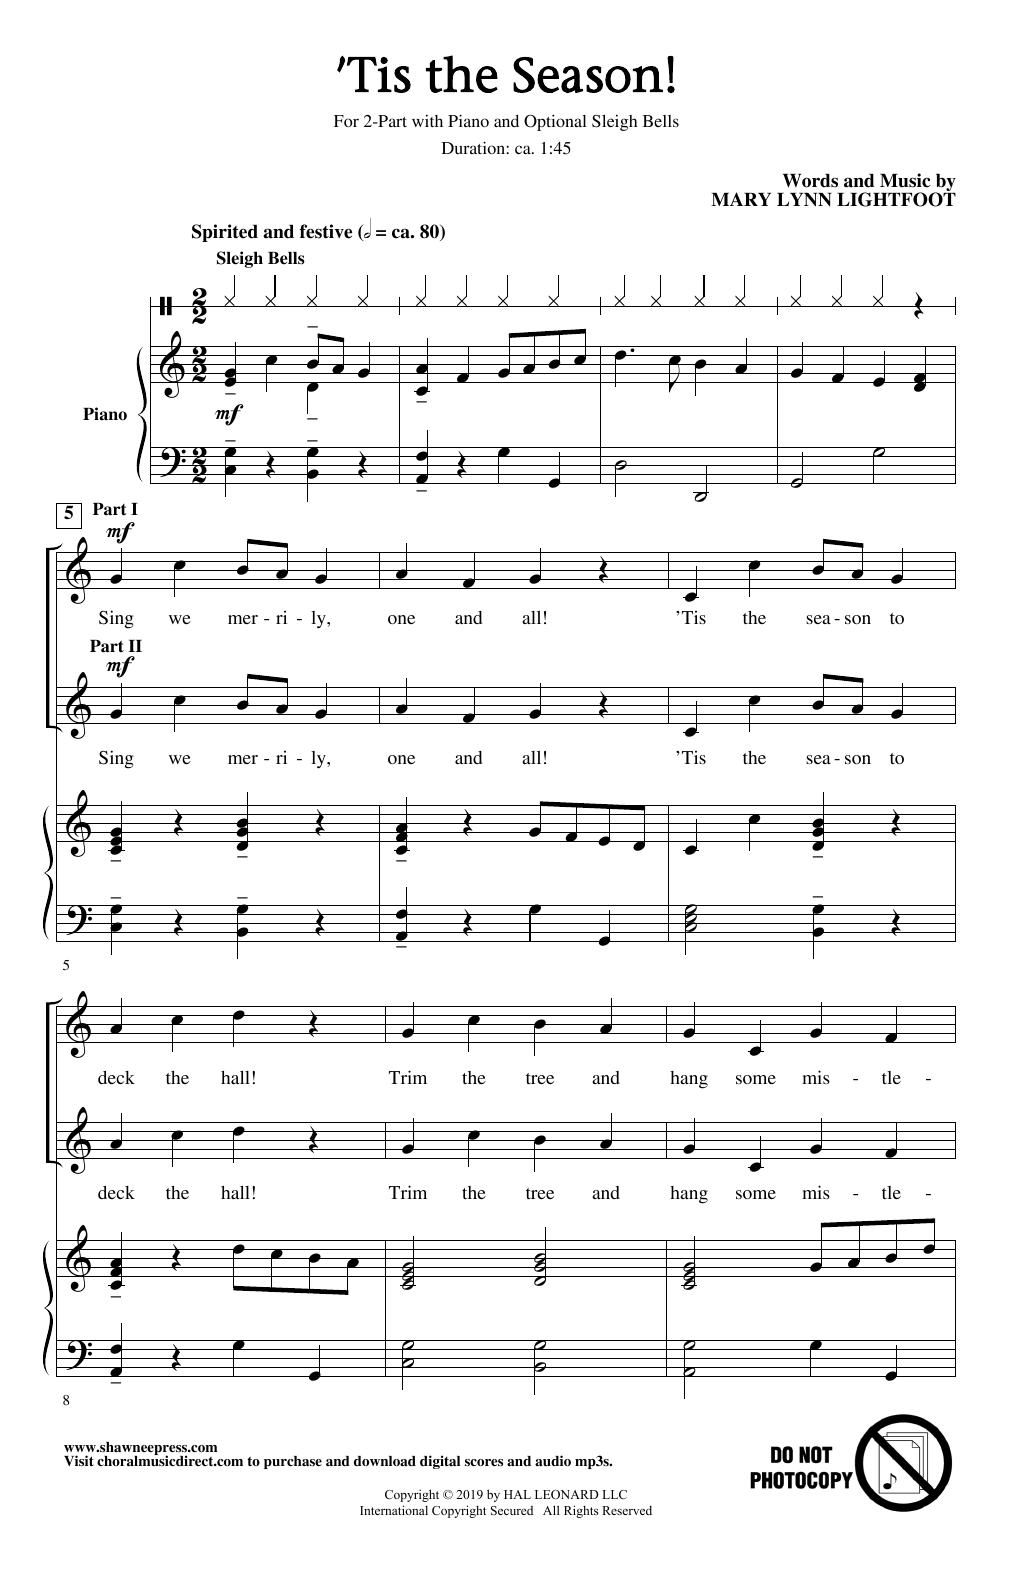 Mary Lynn Lightfoot 'Tis The Season! sheet music notes and chords. Download Printable PDF.